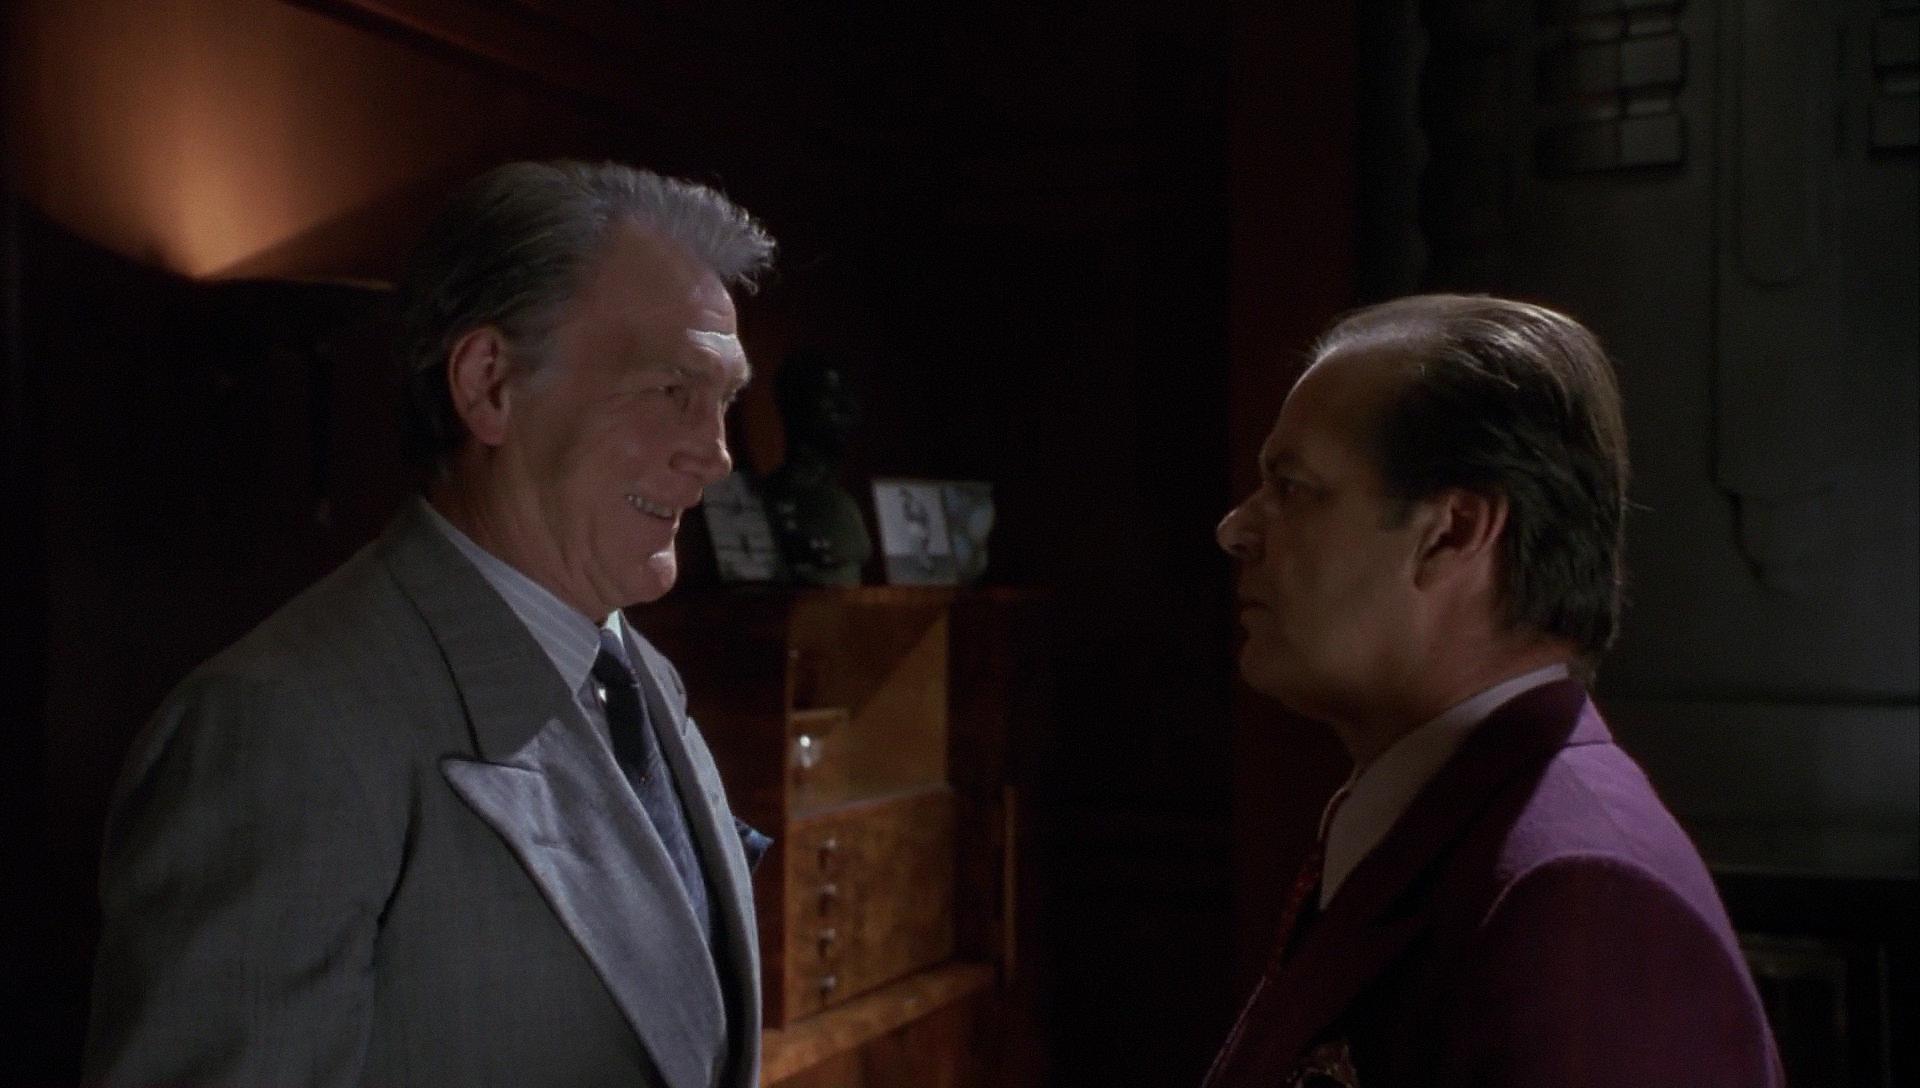 Jack Palance Filmes Ideal batman (1989) jack palance , as ,carl grissom , tim burton film